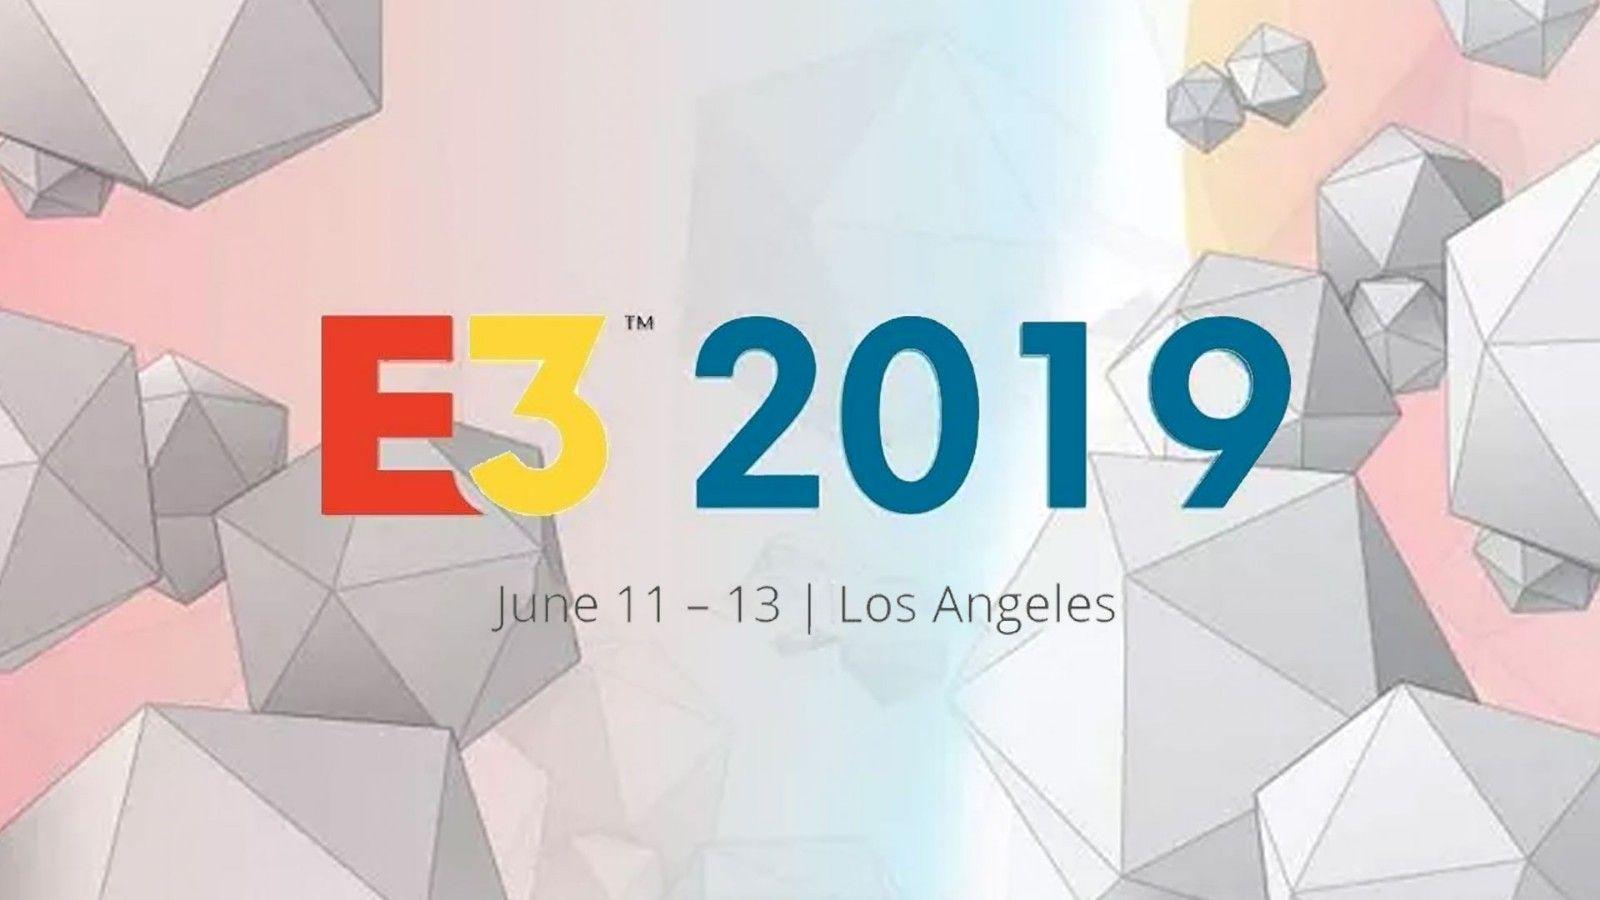 A9VG E3 2019專題頁面   一起看E3全程報道